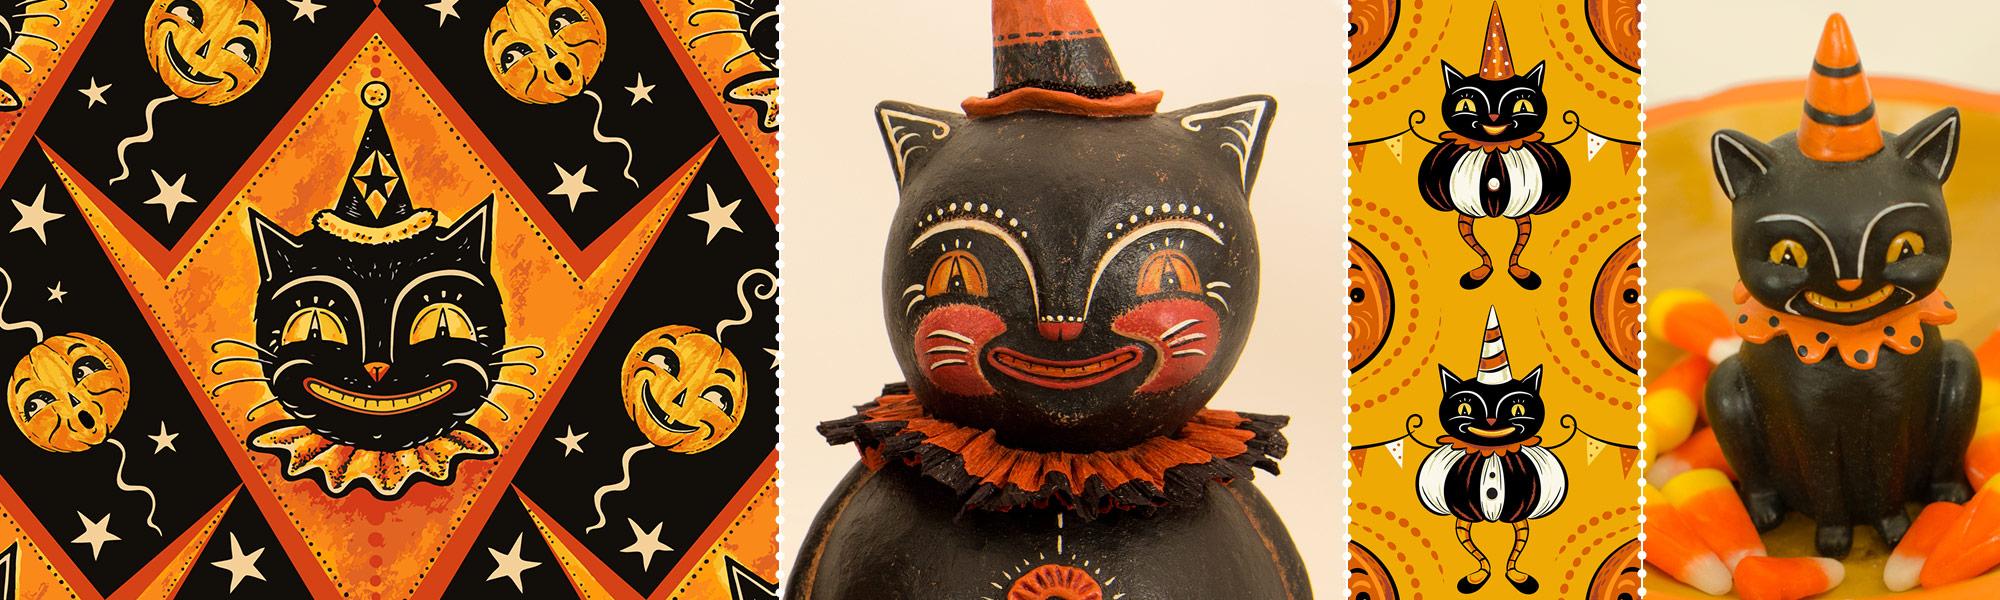 Johanna-Parker-Black-Cat-Halloween-Banner.jpg